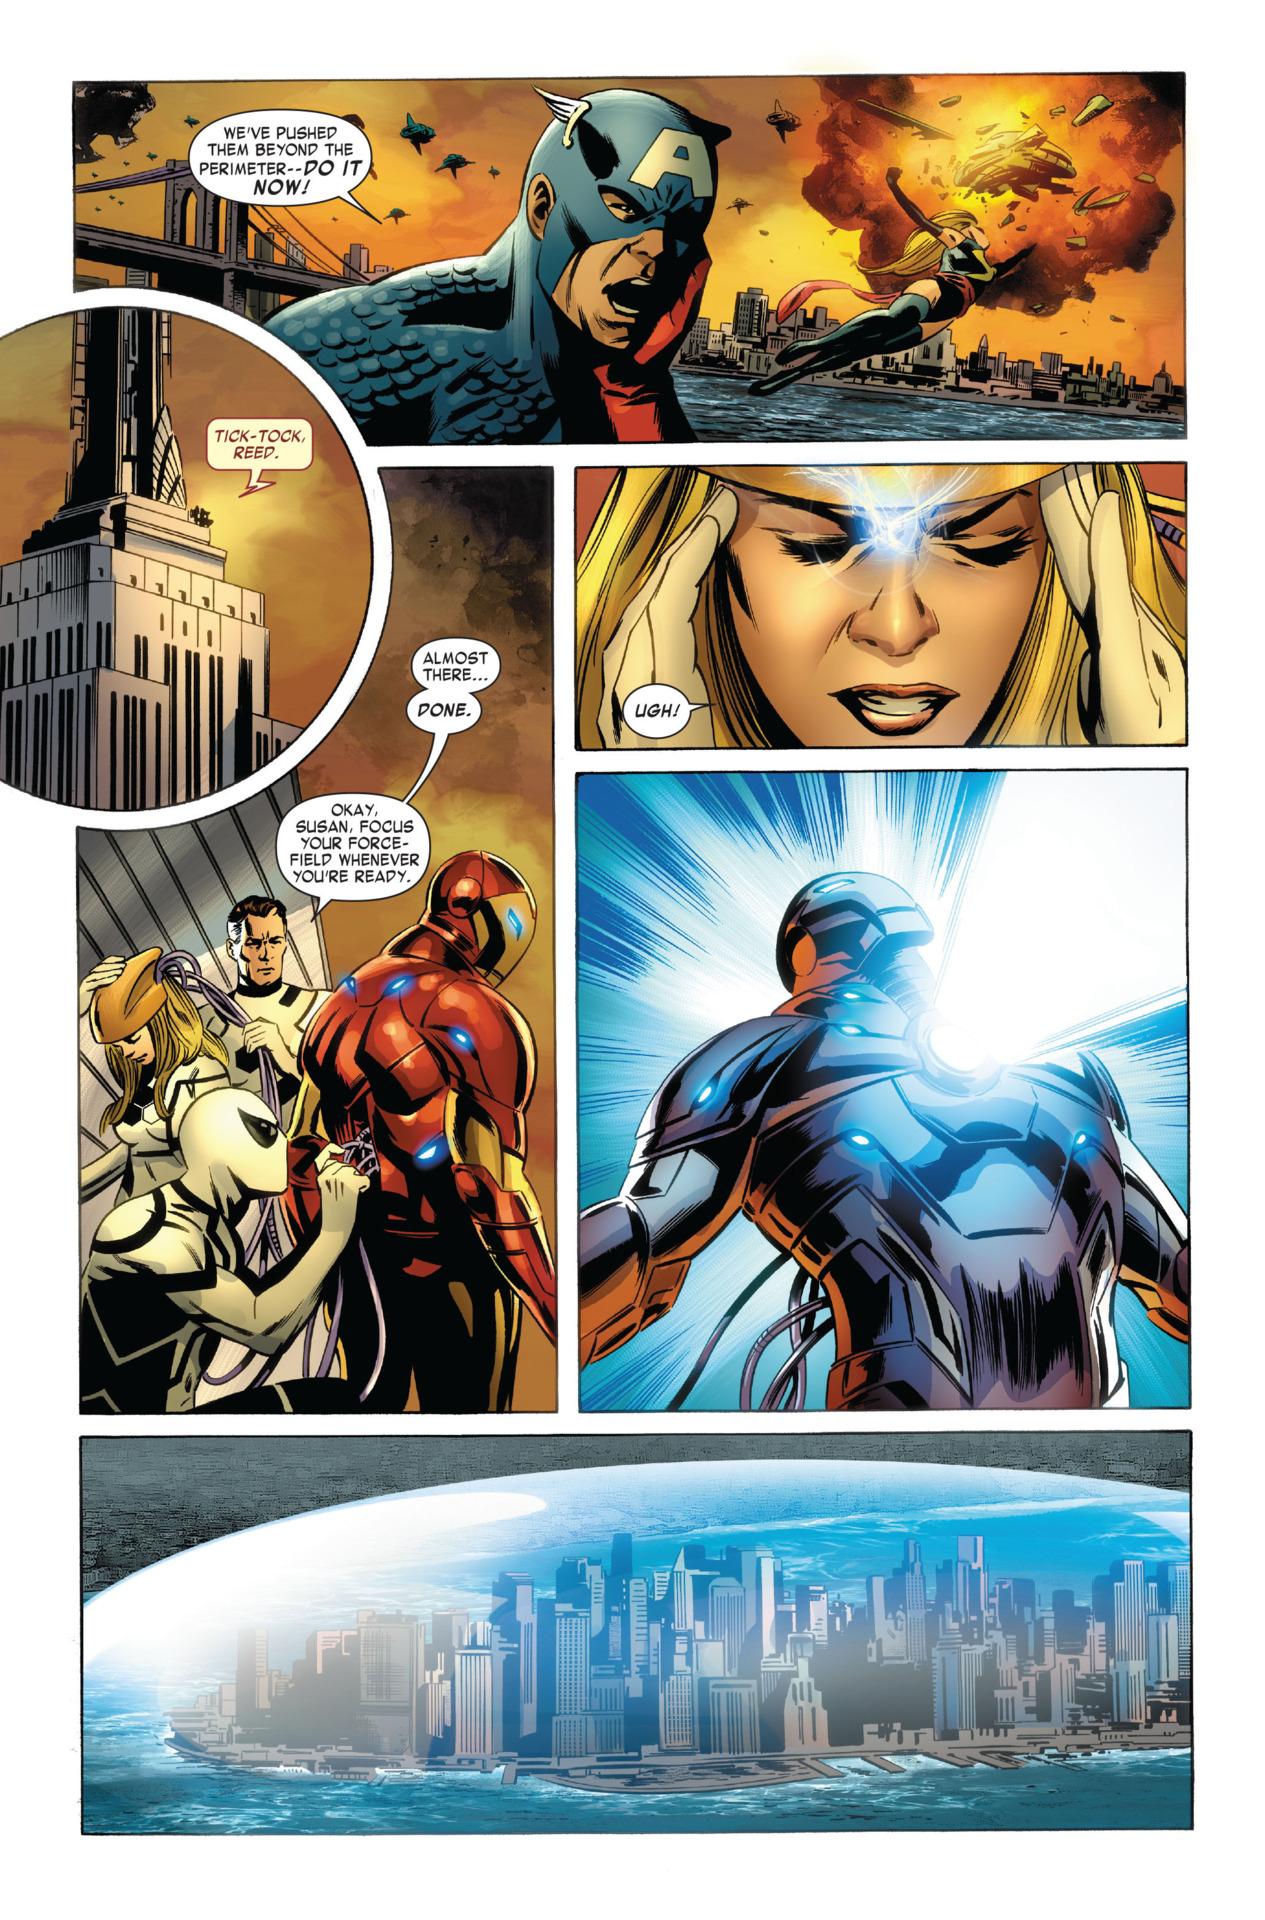 Fantastic Four #600